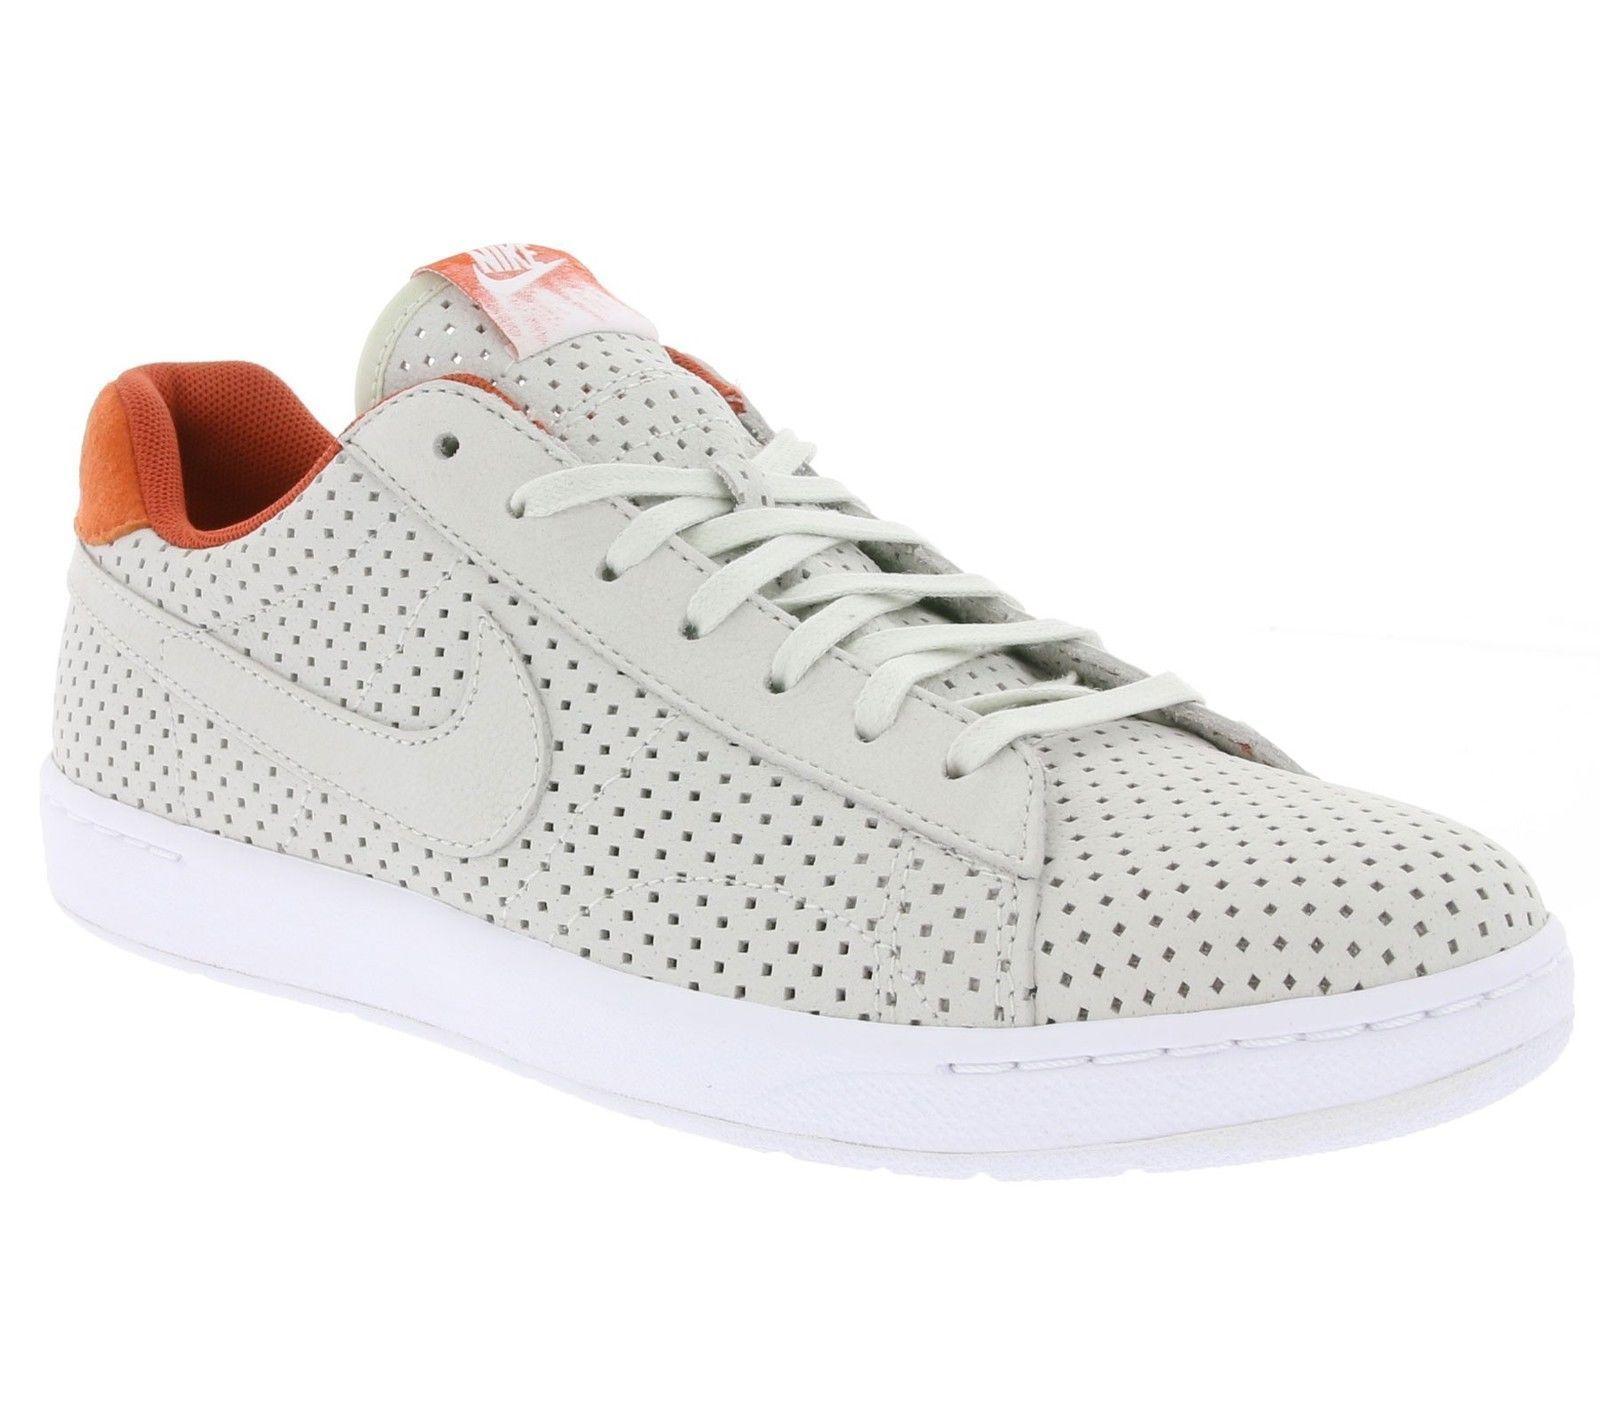 sports shoes 631df 20c1a Nike Tennis Classic Ultra QS Men s Shoes White Orange 807175-008 Size 9.5 -  11